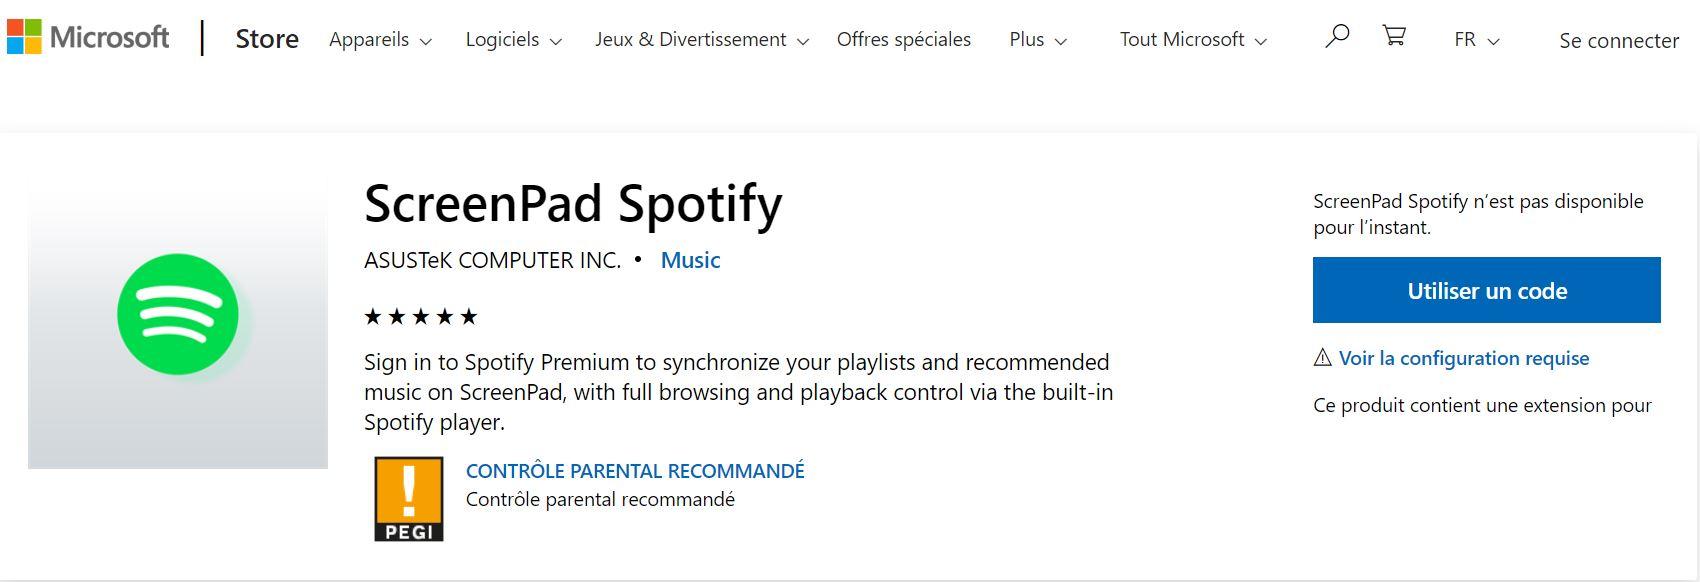 ASUS ScreenPad Spotify App Missing - The Spotify Community